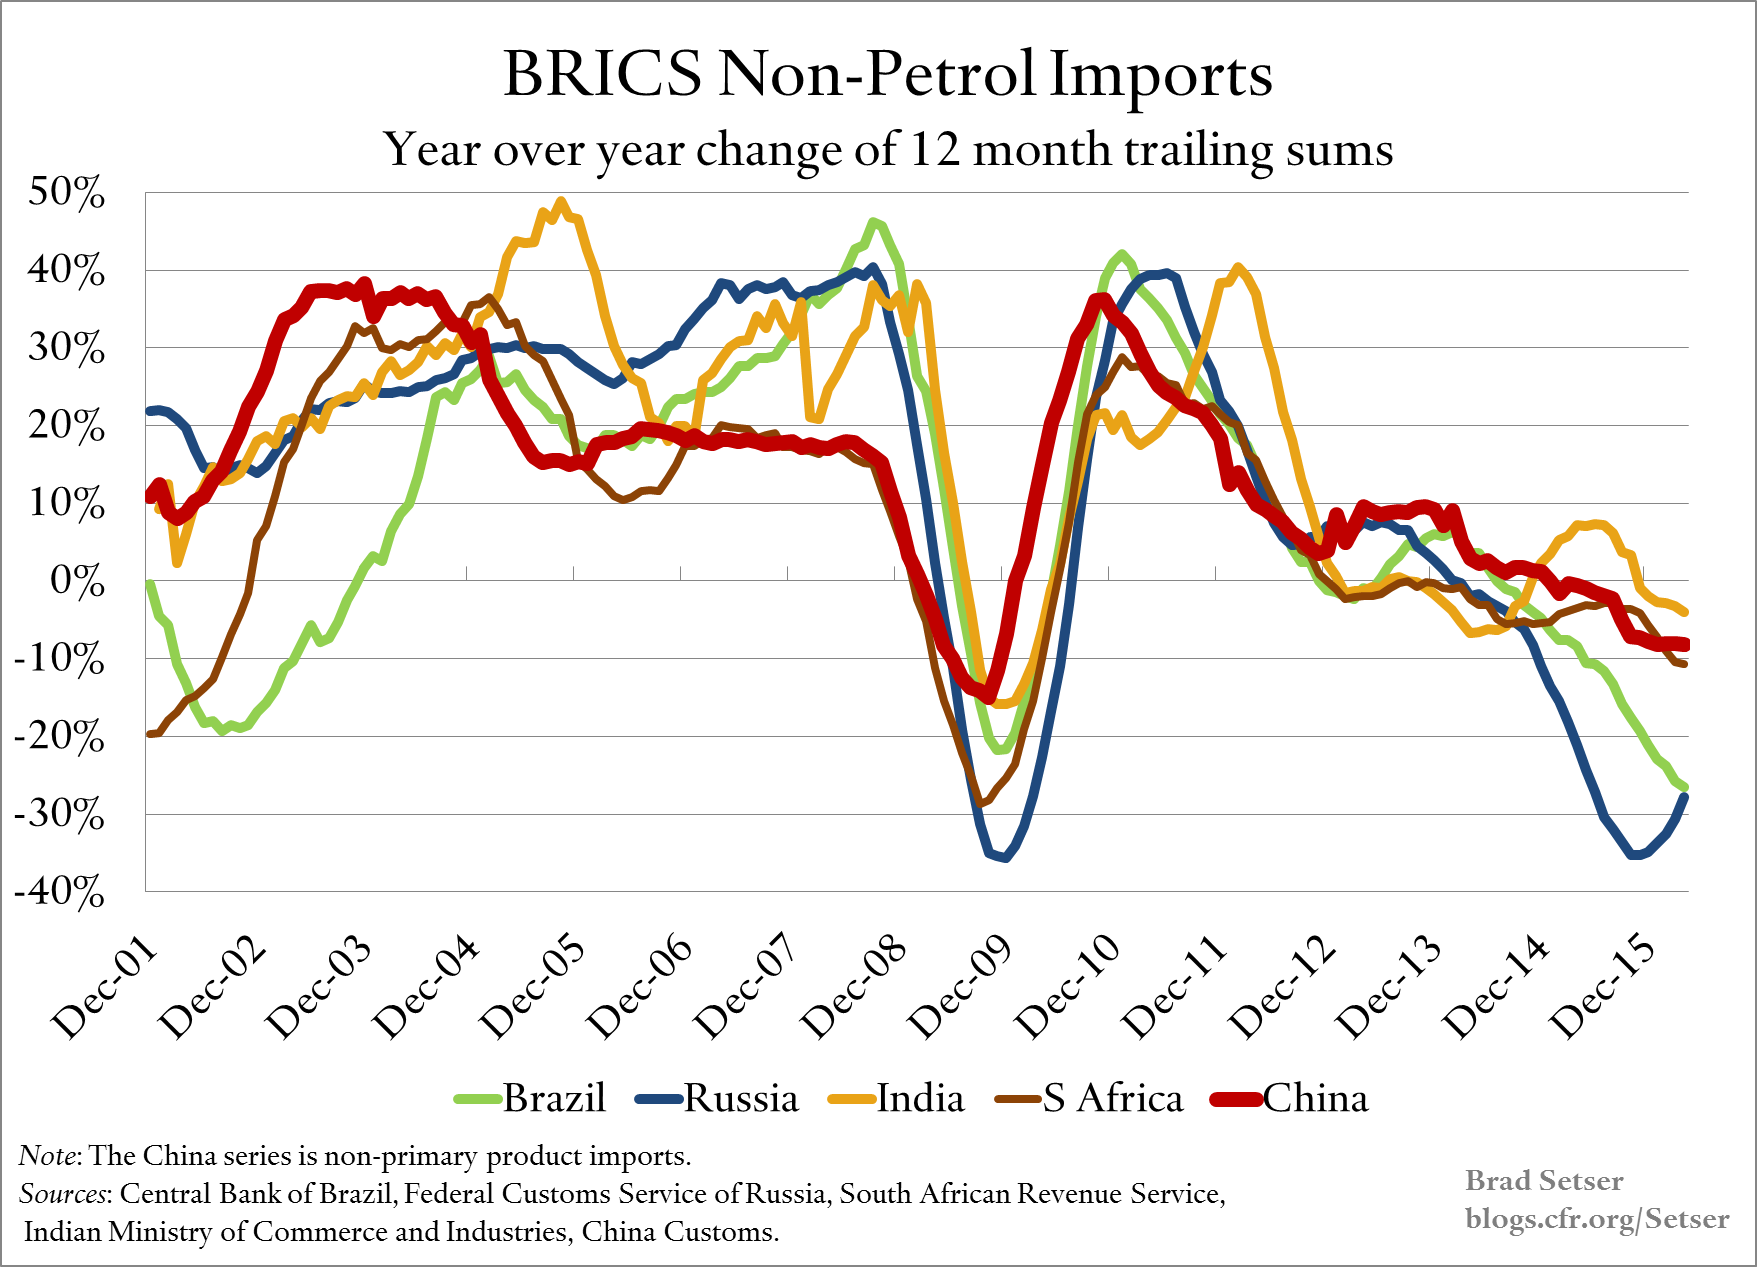 Non-Petrol Imports